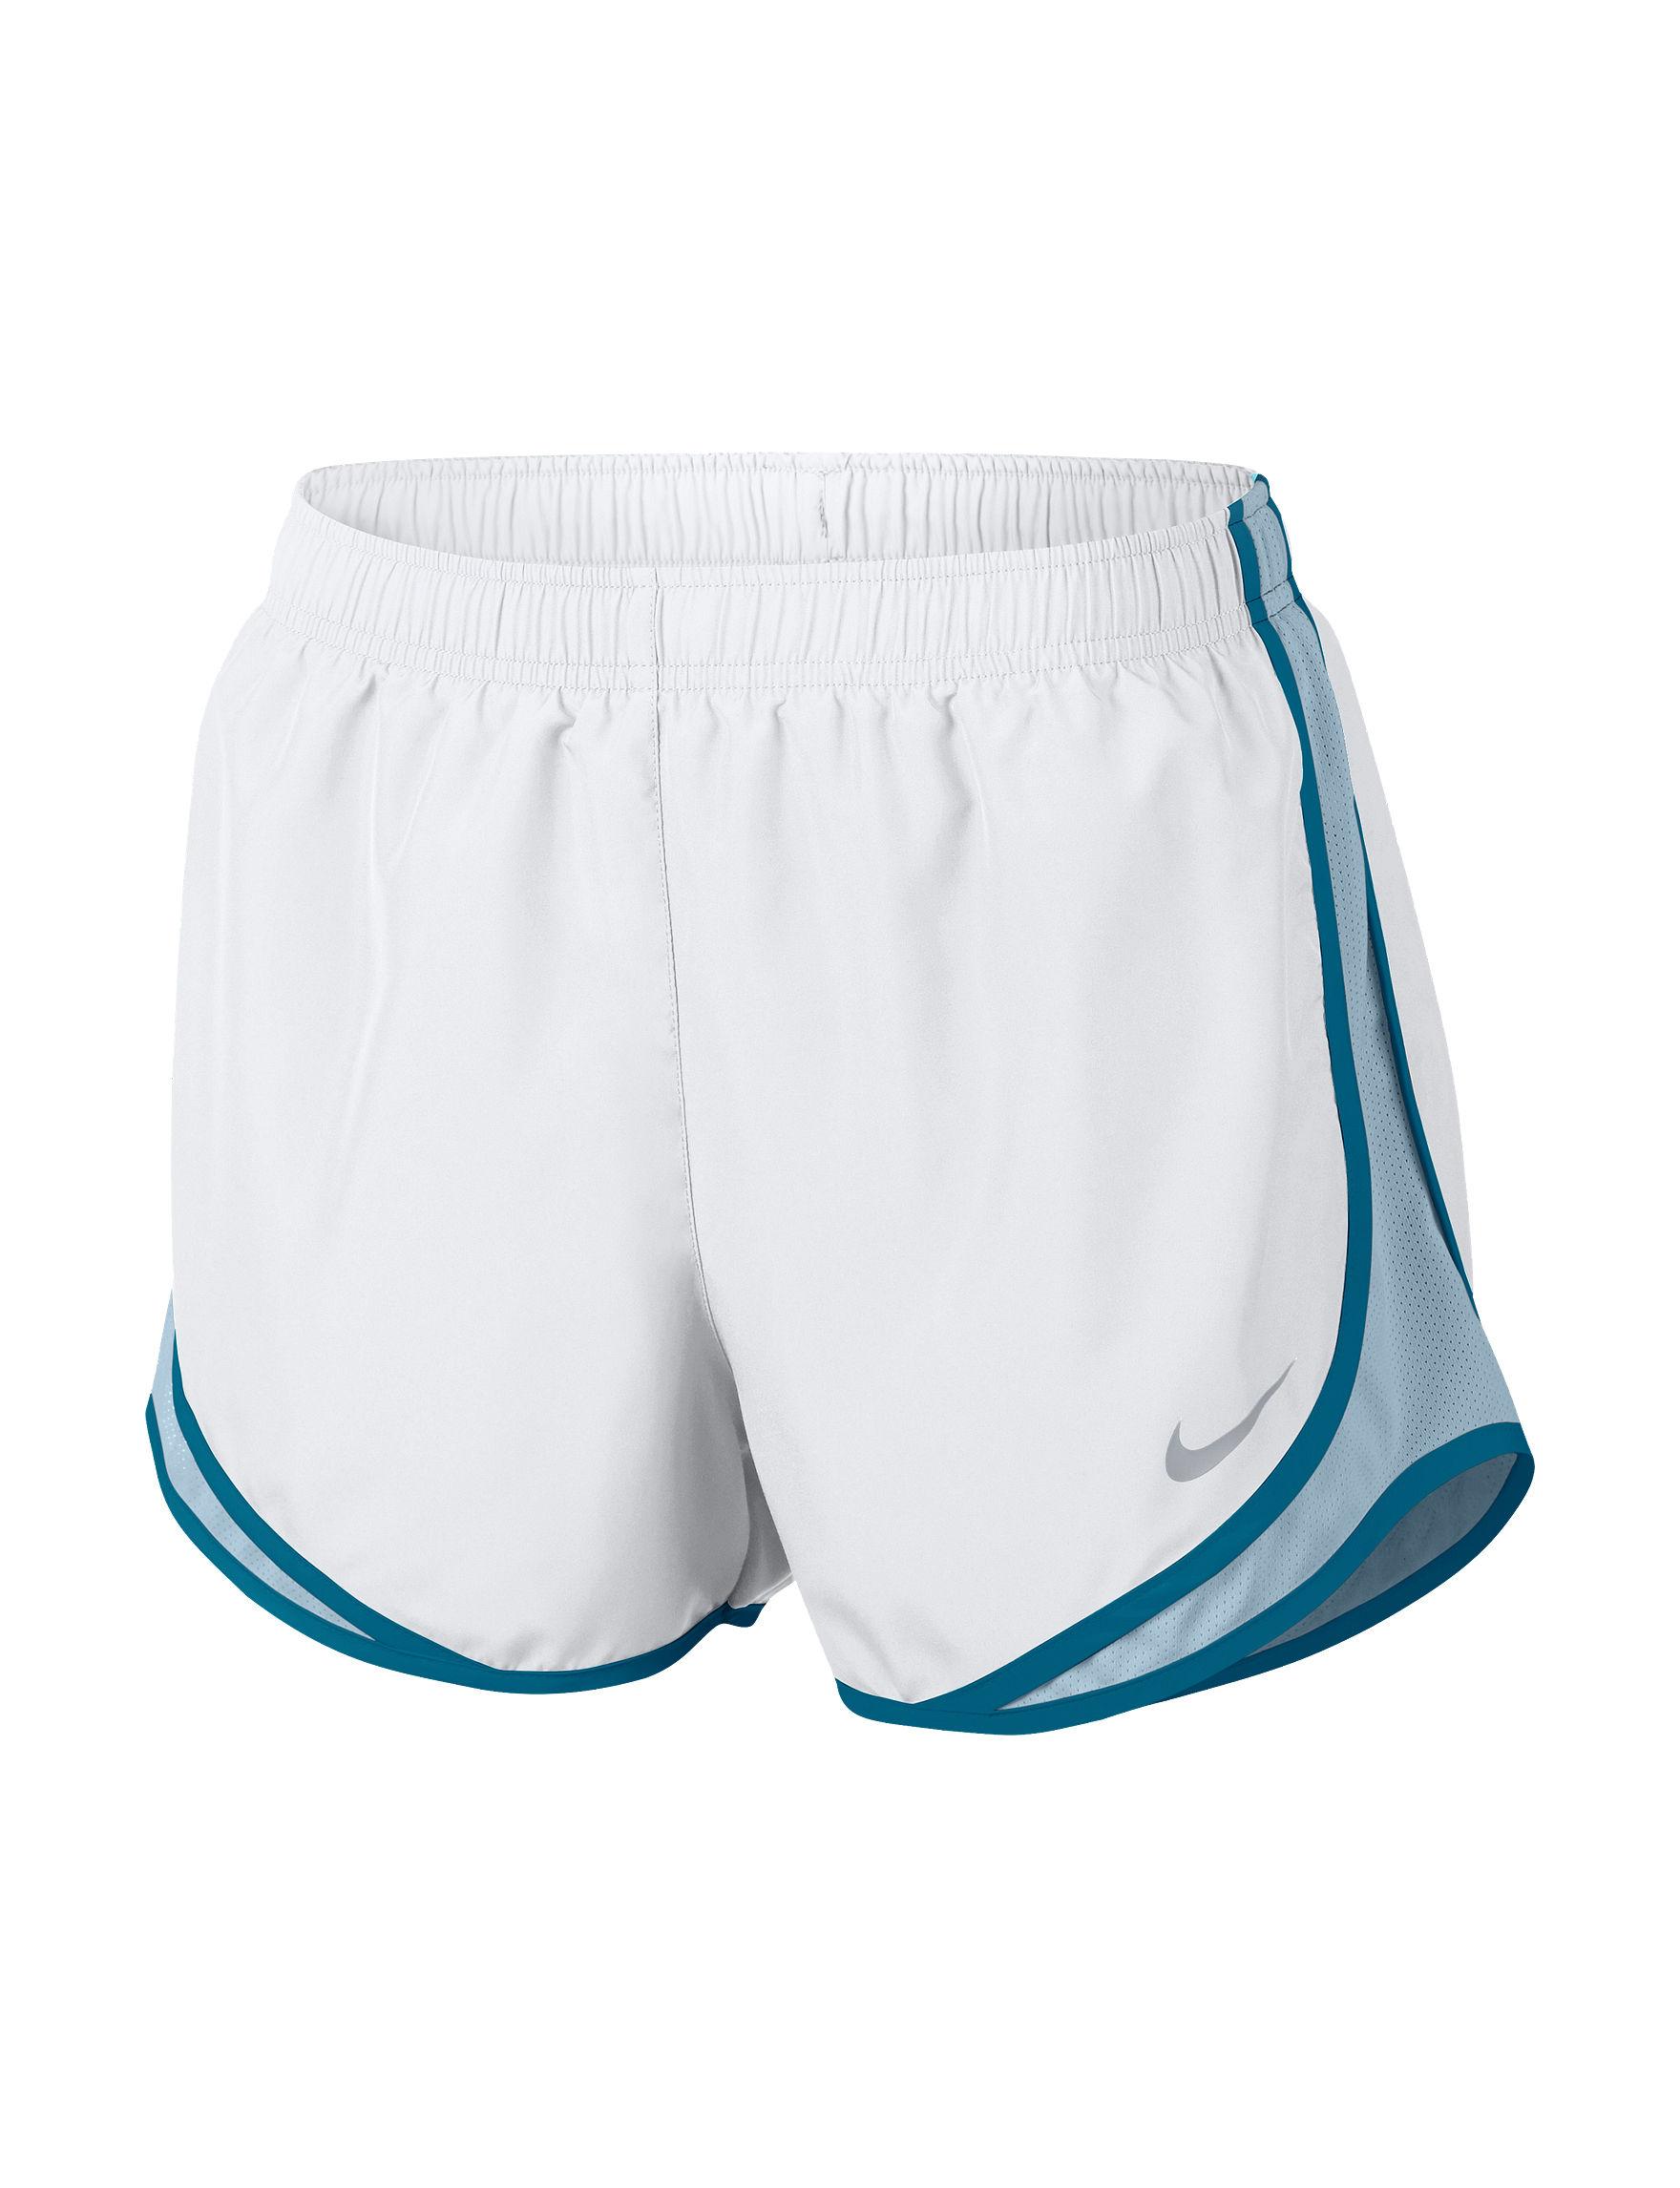 Nike White Active